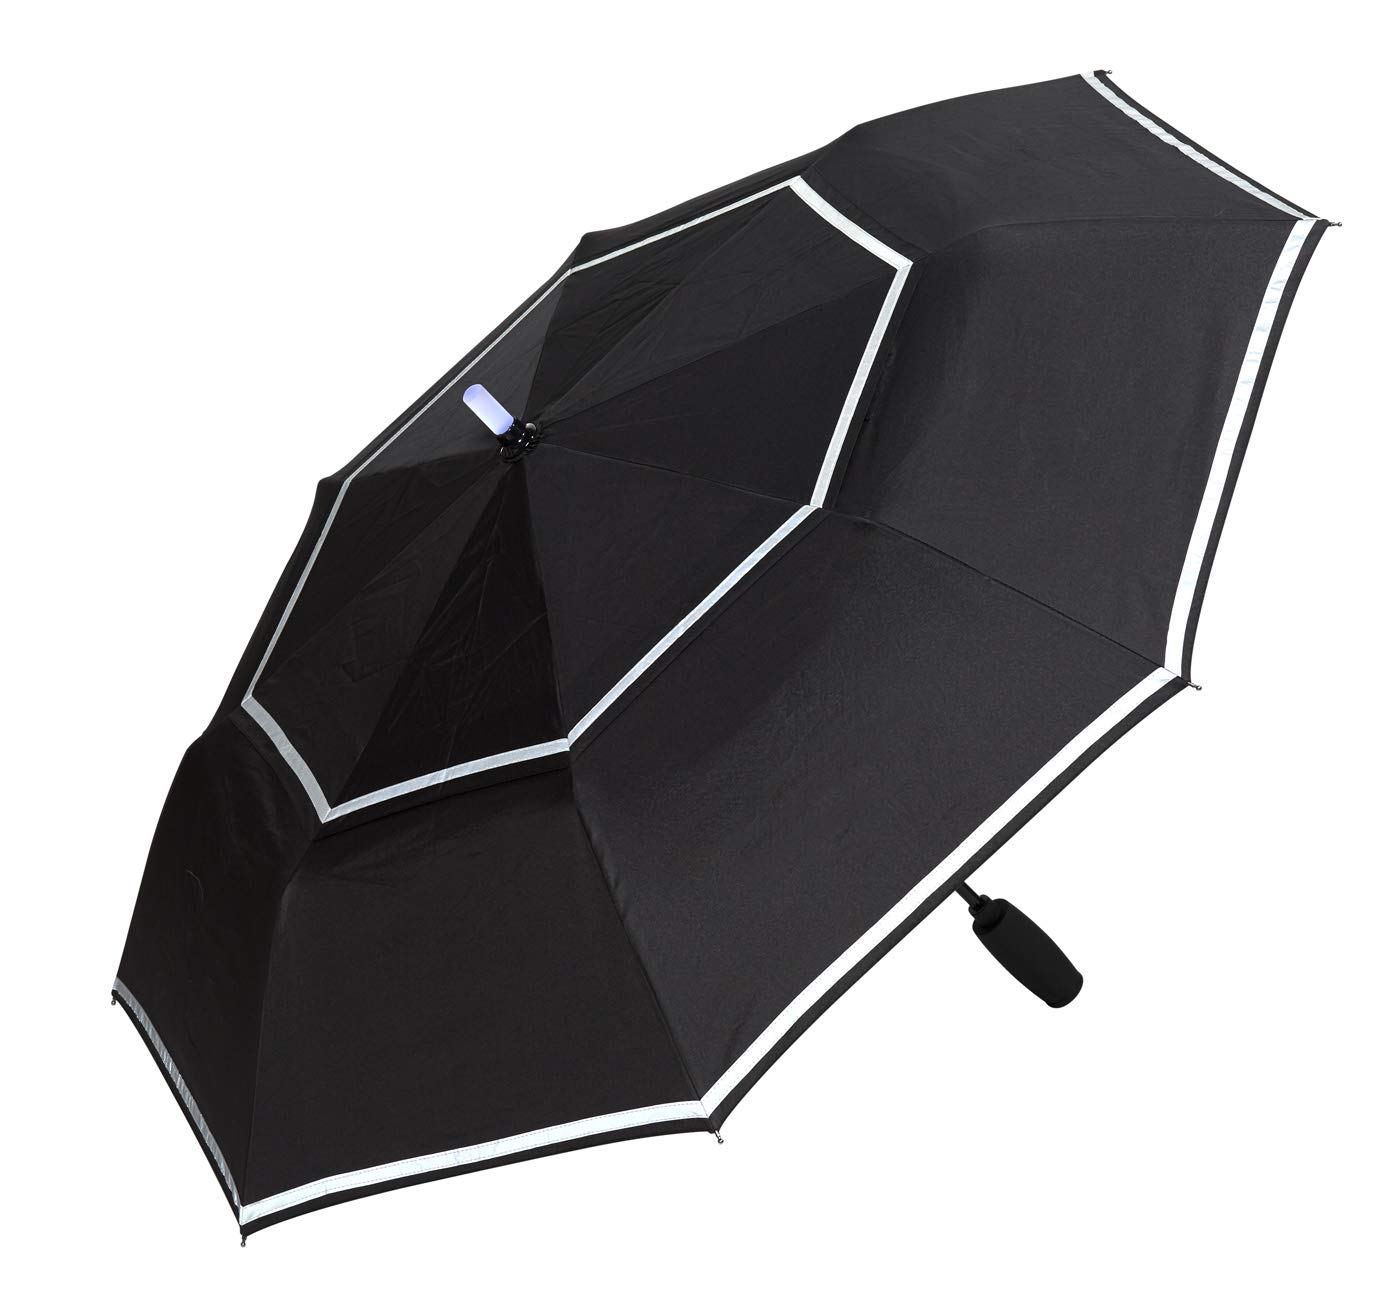 LifeLight LED Reflective Pedestrian Life Safety Windproof Umbrella. Tech Ready.